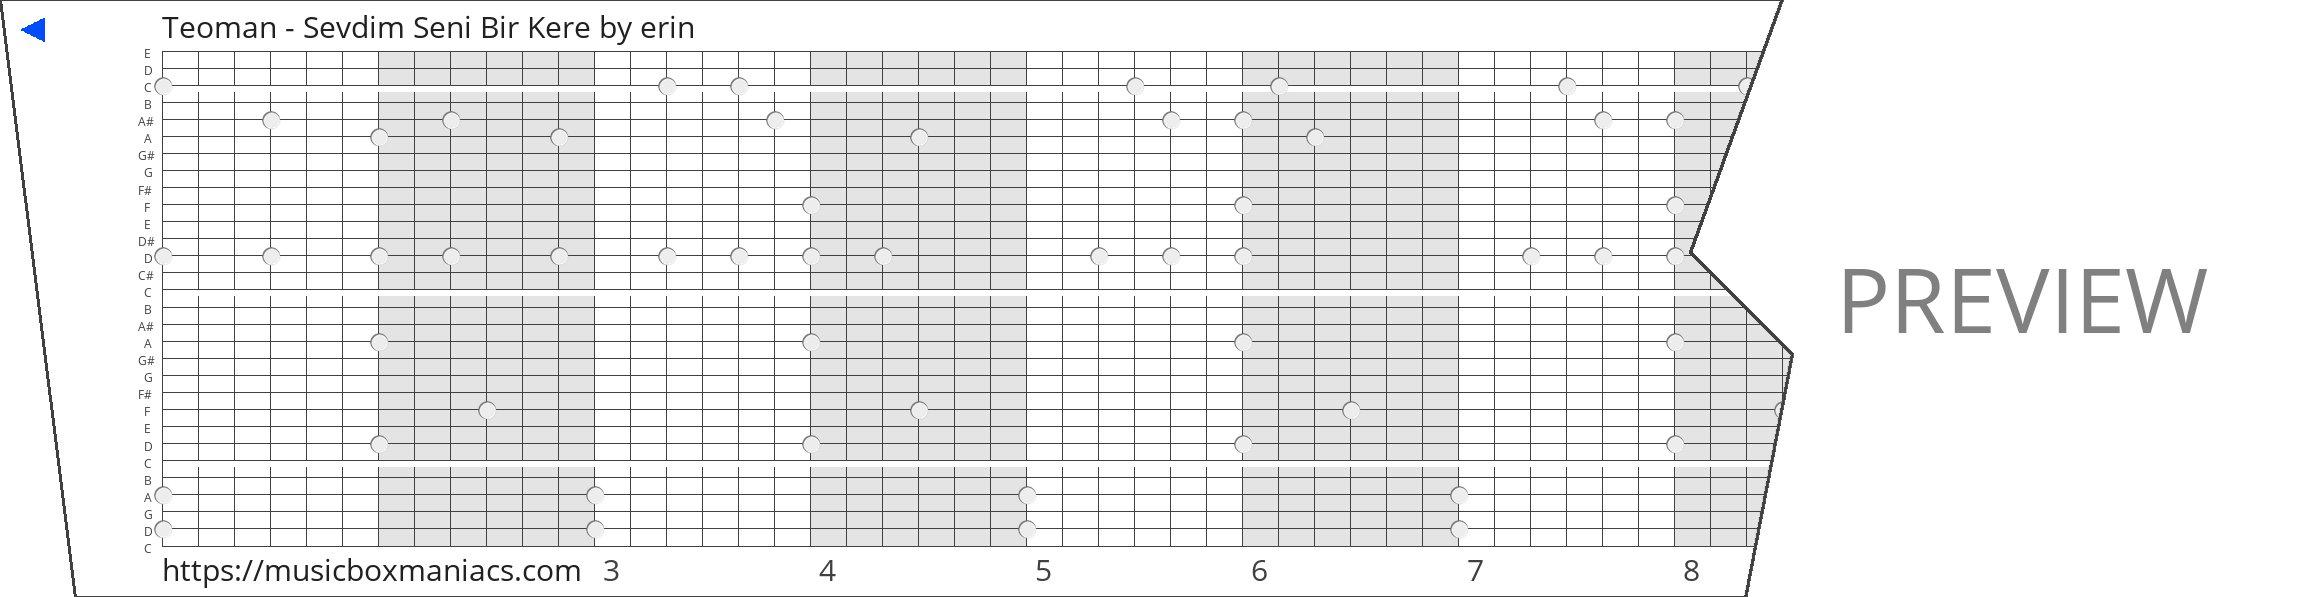 Teoman - Sevdim Seni Bir Kere 30 note music box paper strip